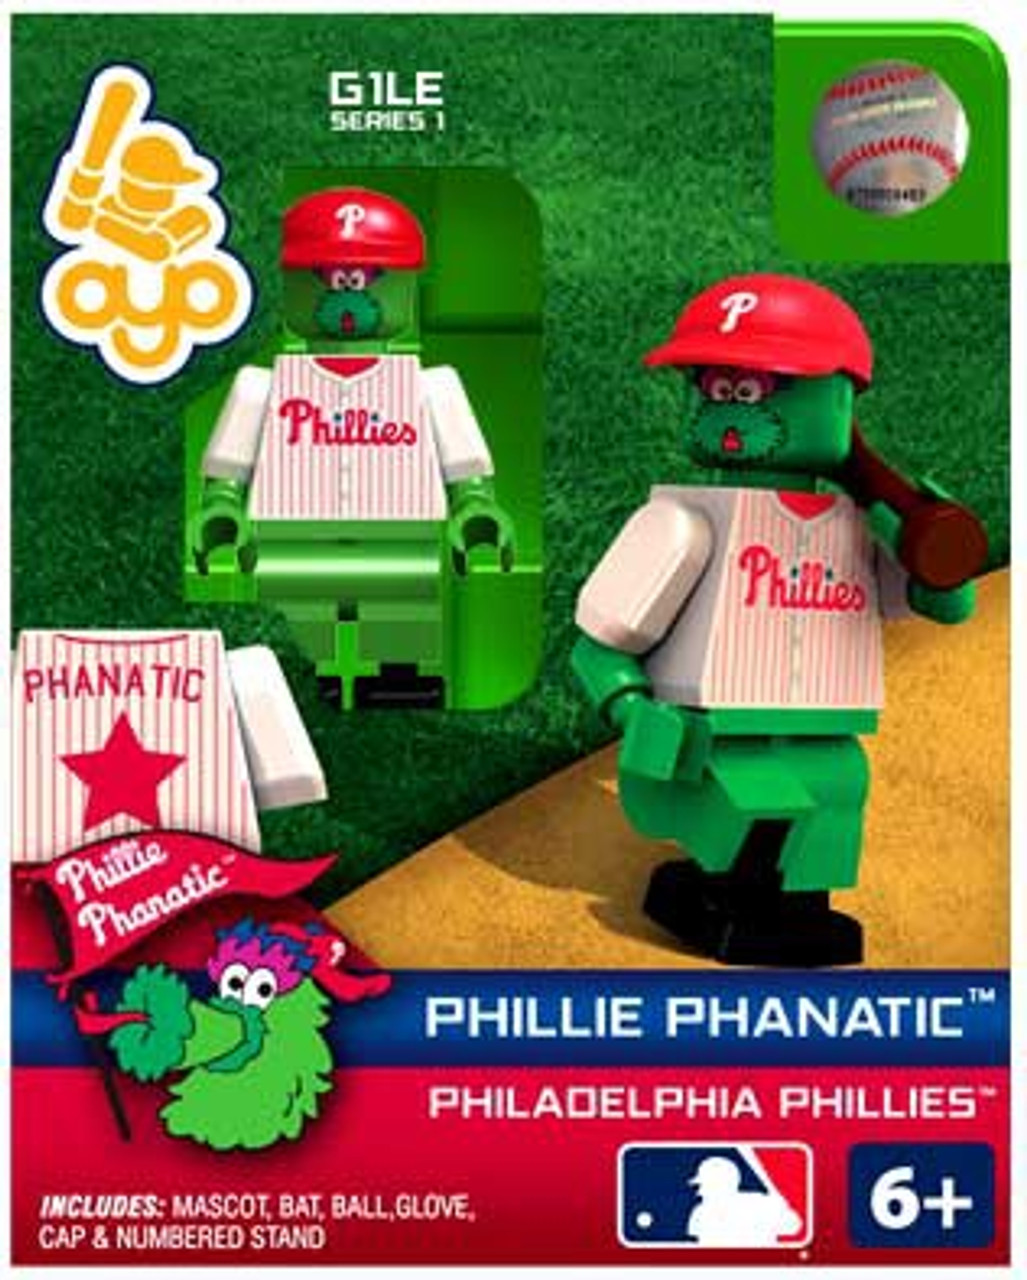 Philidelphia Phillies MLB Generation 1 Series 1 Phillie Phanatic Minifigure